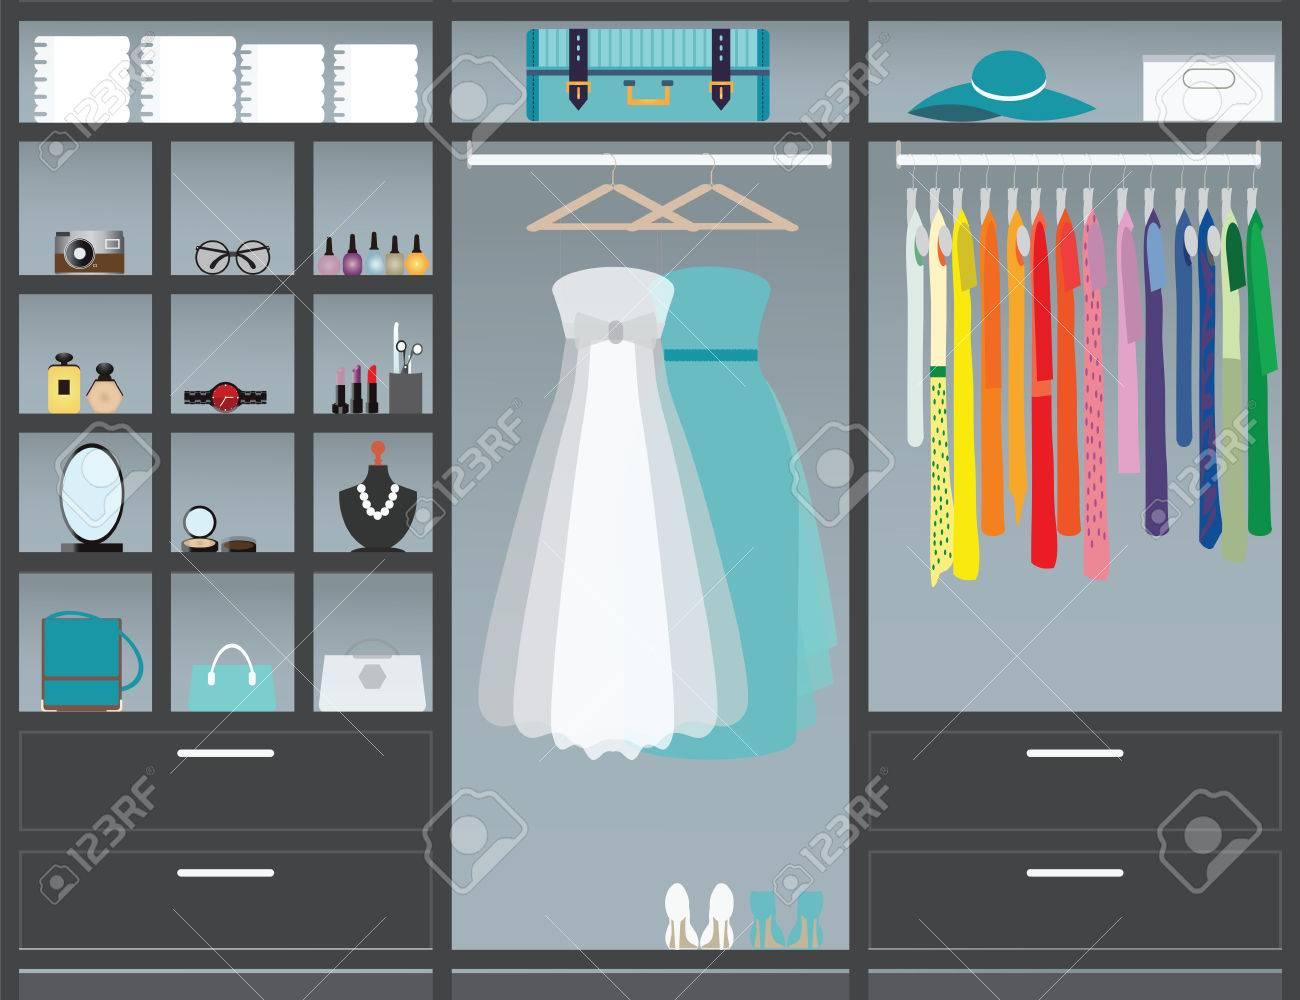 Great Flat Design Walk In Closet, Interior Design, Clothing Store, Boutique Indoor  With Cosmetics